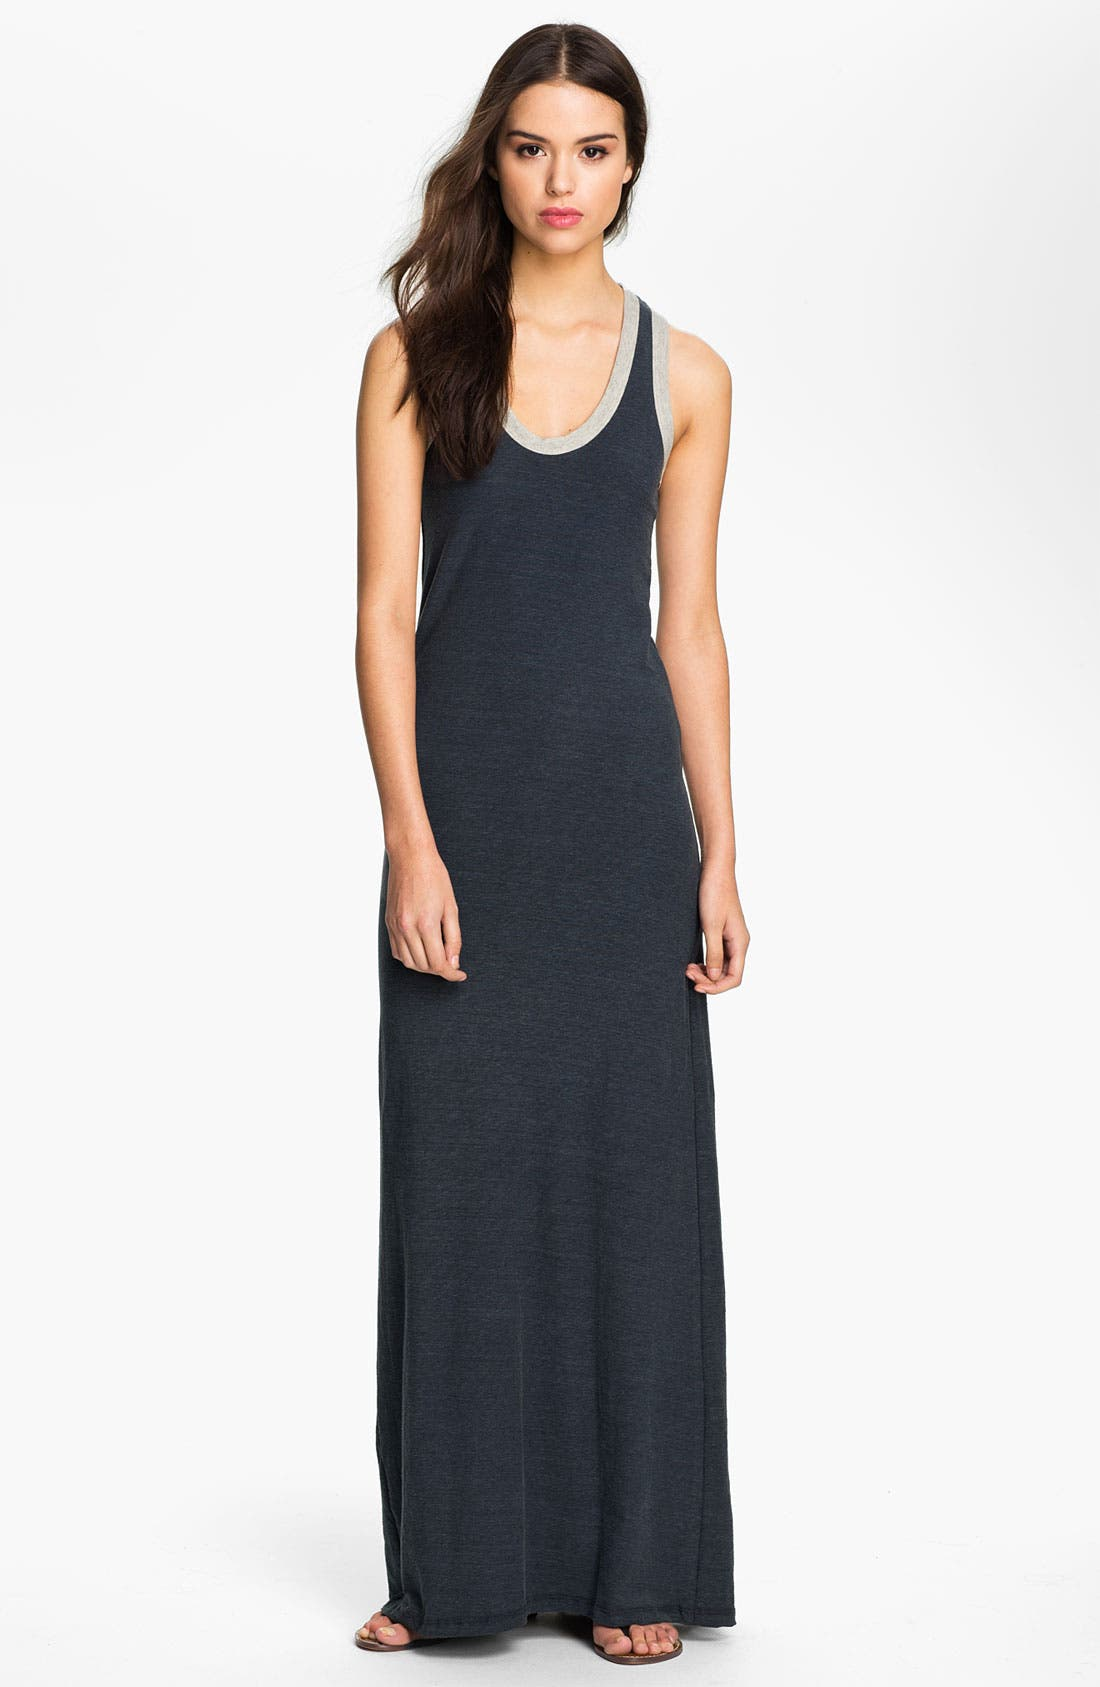 Alternate Image 1 Selected - James Perse Racerback Maxi Dress